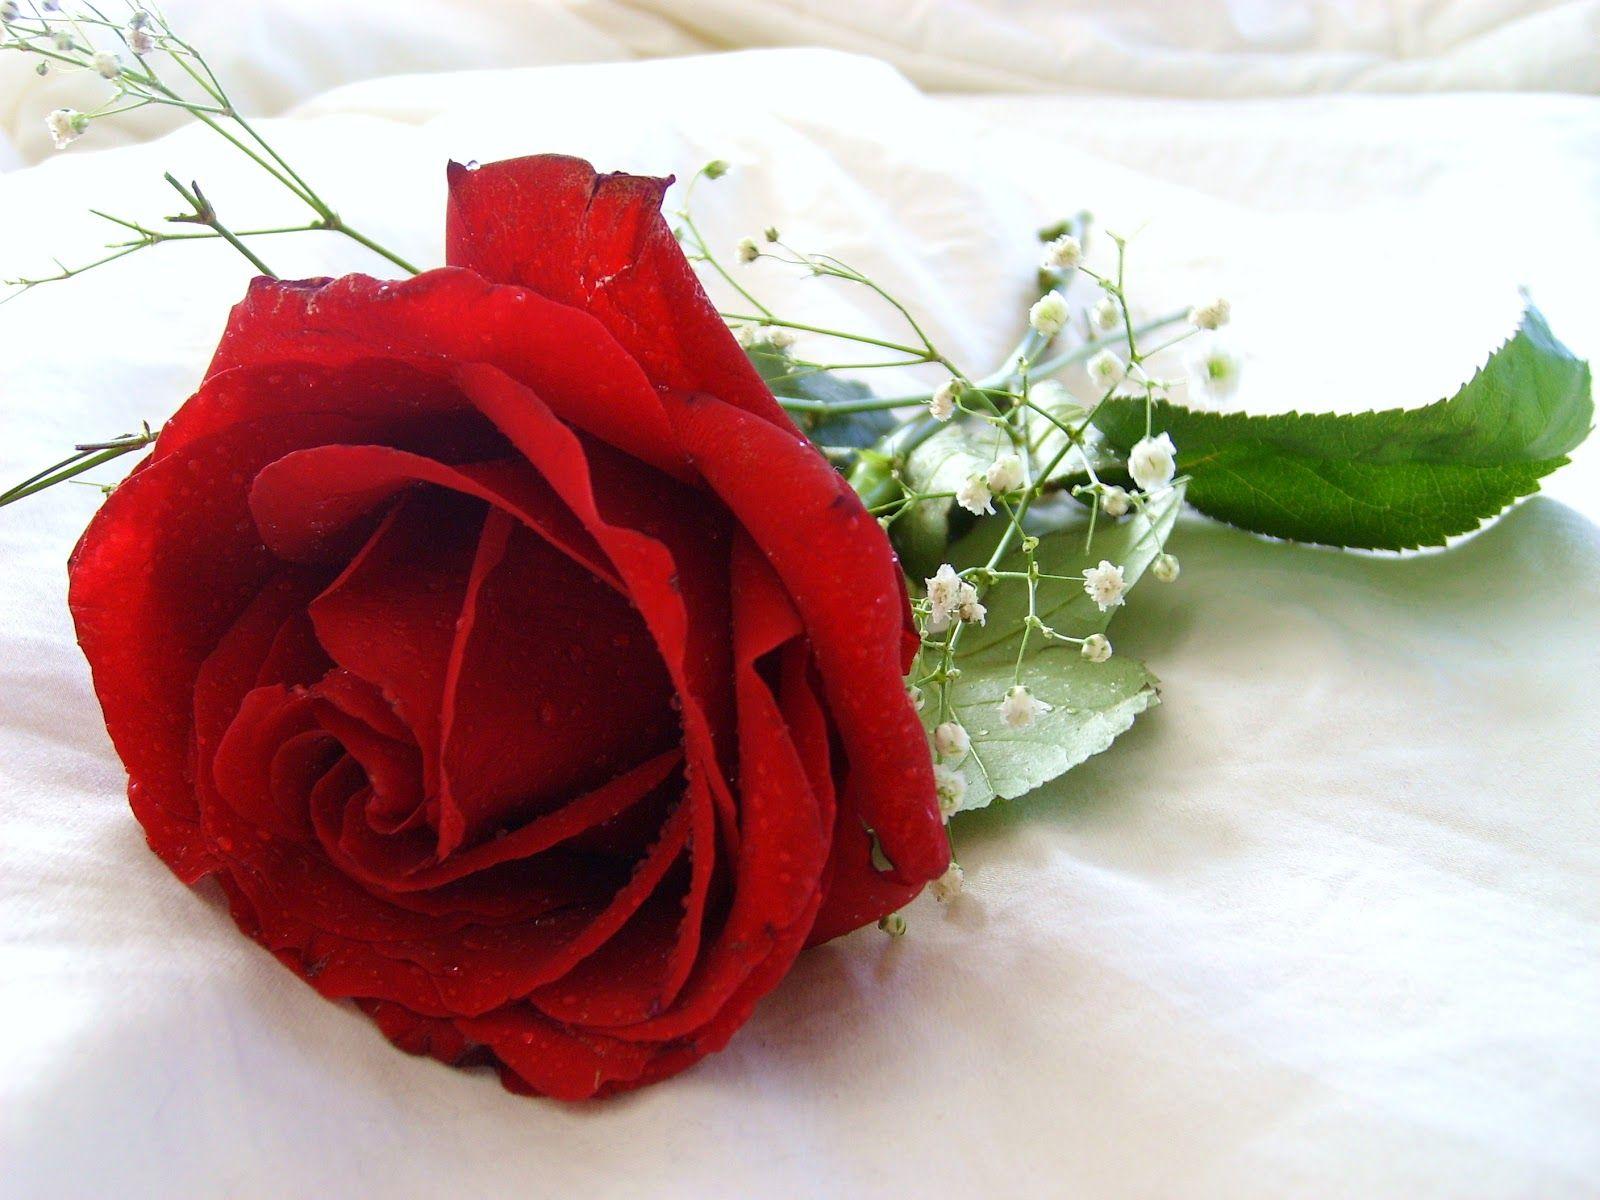 Red Rose Flower Wallpaper Beautiful Flowers 2380 Full HD